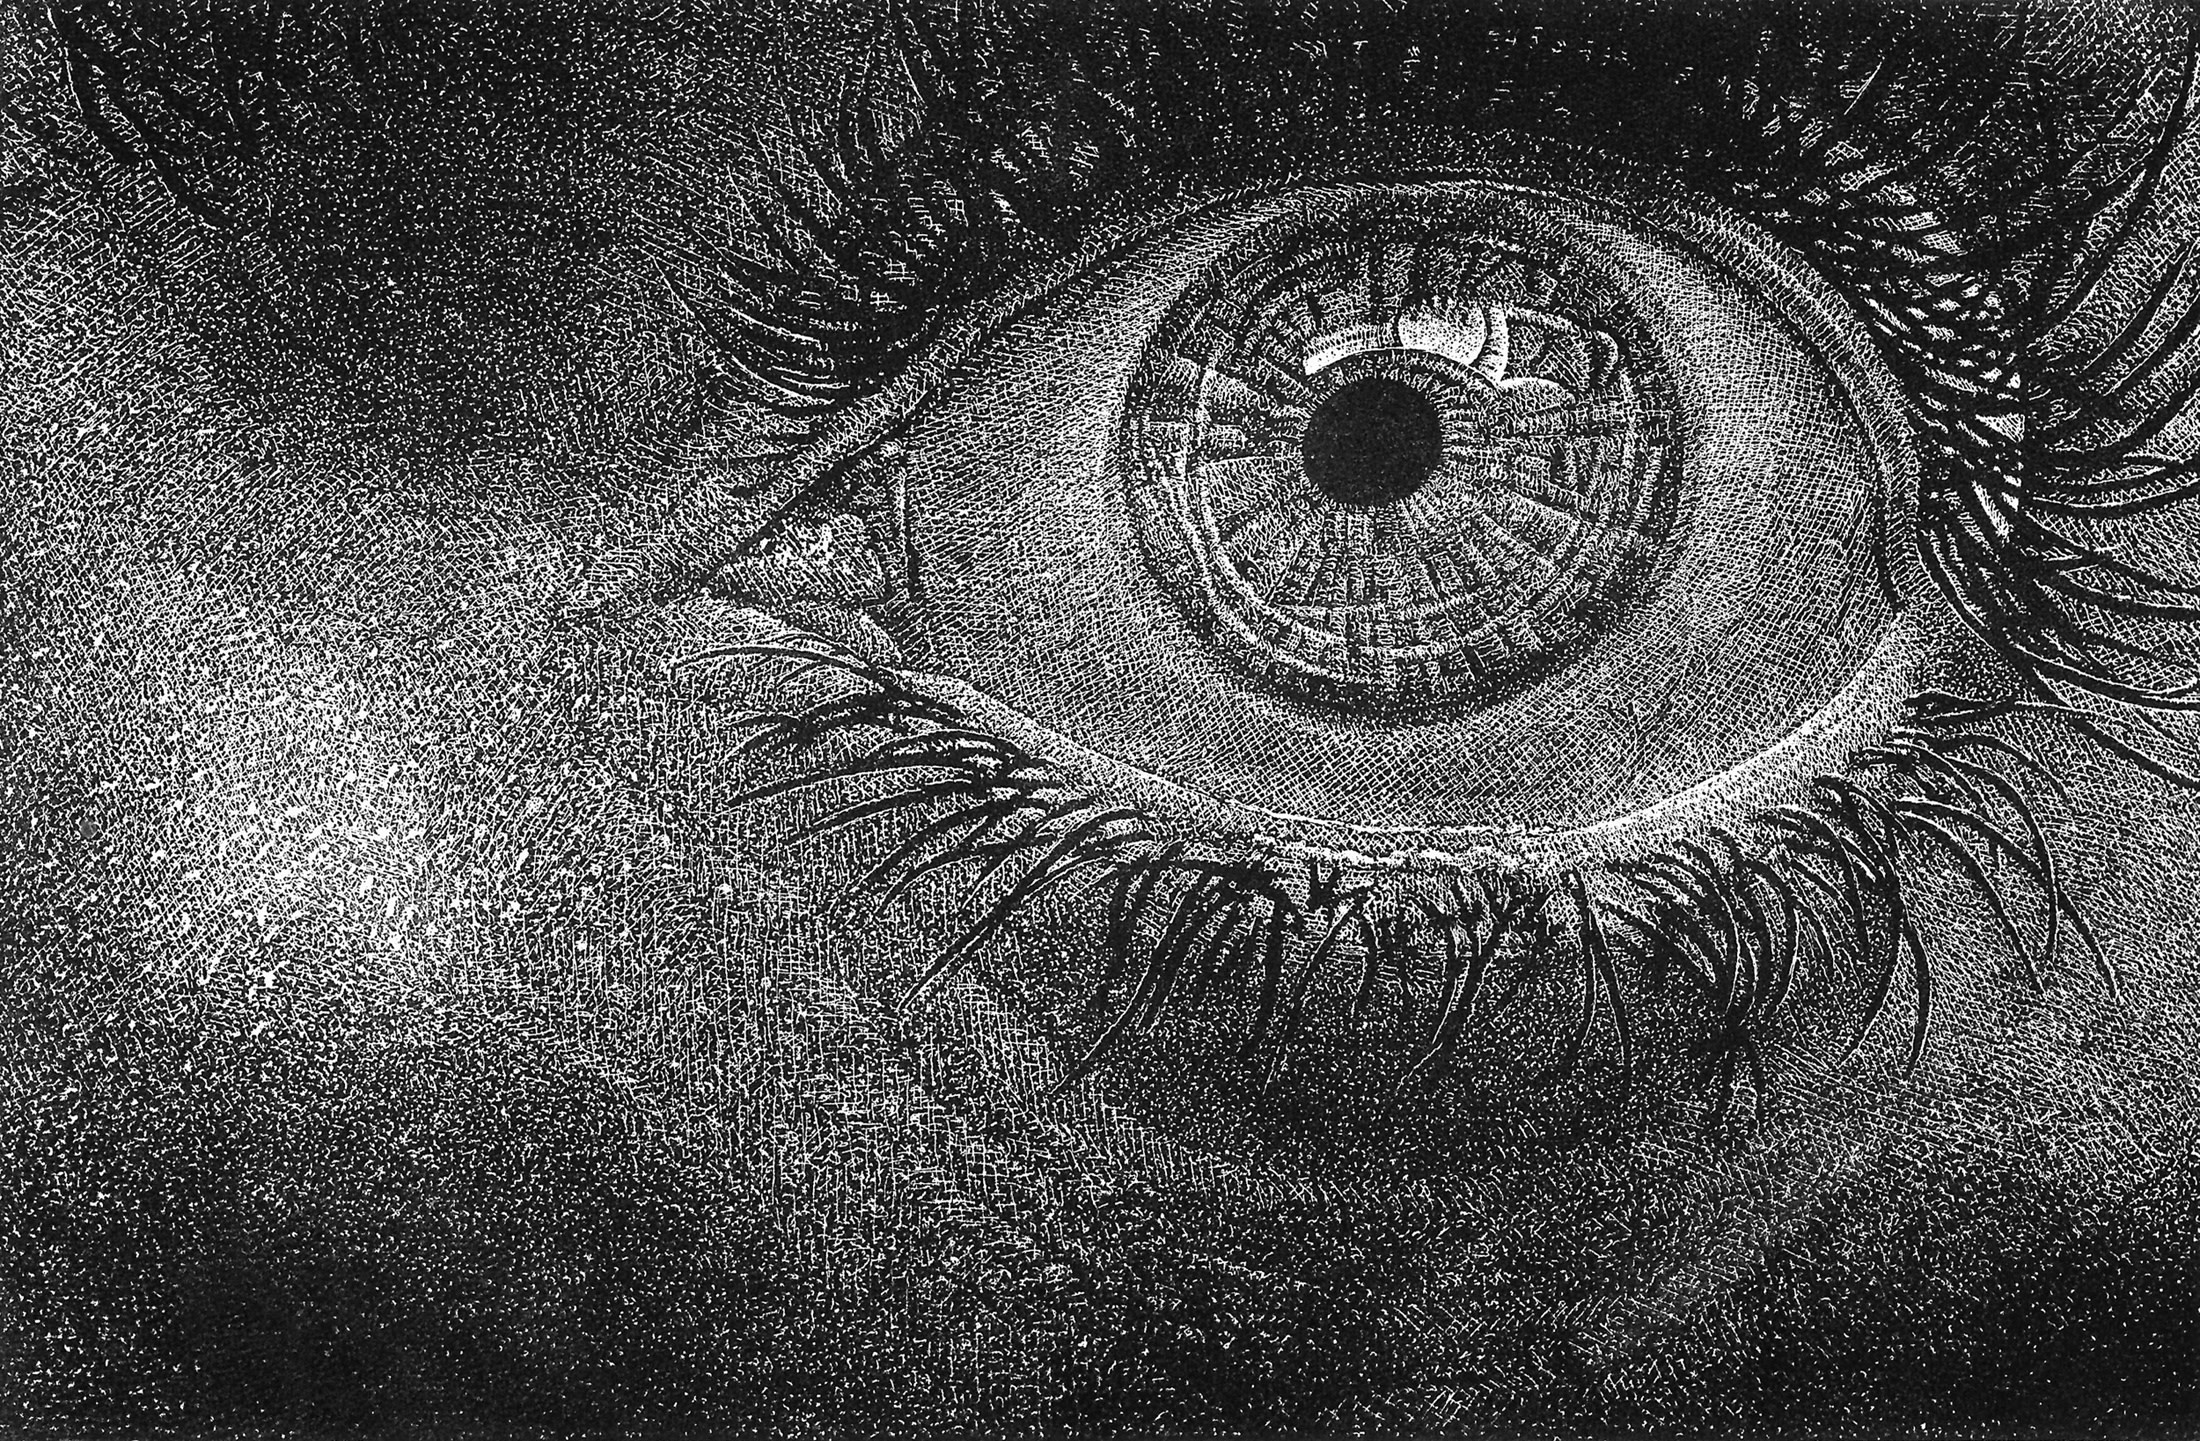 "<span class=""link fancybox-details-link""><a href=""/artists/229-raphael-appignanesi-are/works/11148/"">View Detail Page</a></span><div class=""artist""><span class=""artist""><strong>Raphael Appignanesi ARE</strong></span></div><div class=""title""><em>Self Portrait</em></div><div class=""medium"">relief etching</div><div class=""dimensions"">53 x 73 cm framed<br /> 40 x 59 cm image size<br /> </div><div class=""edition_details"">edition of 50</div><div class=""price"">£190.00 framed<br>£180.00 unframed</div>"